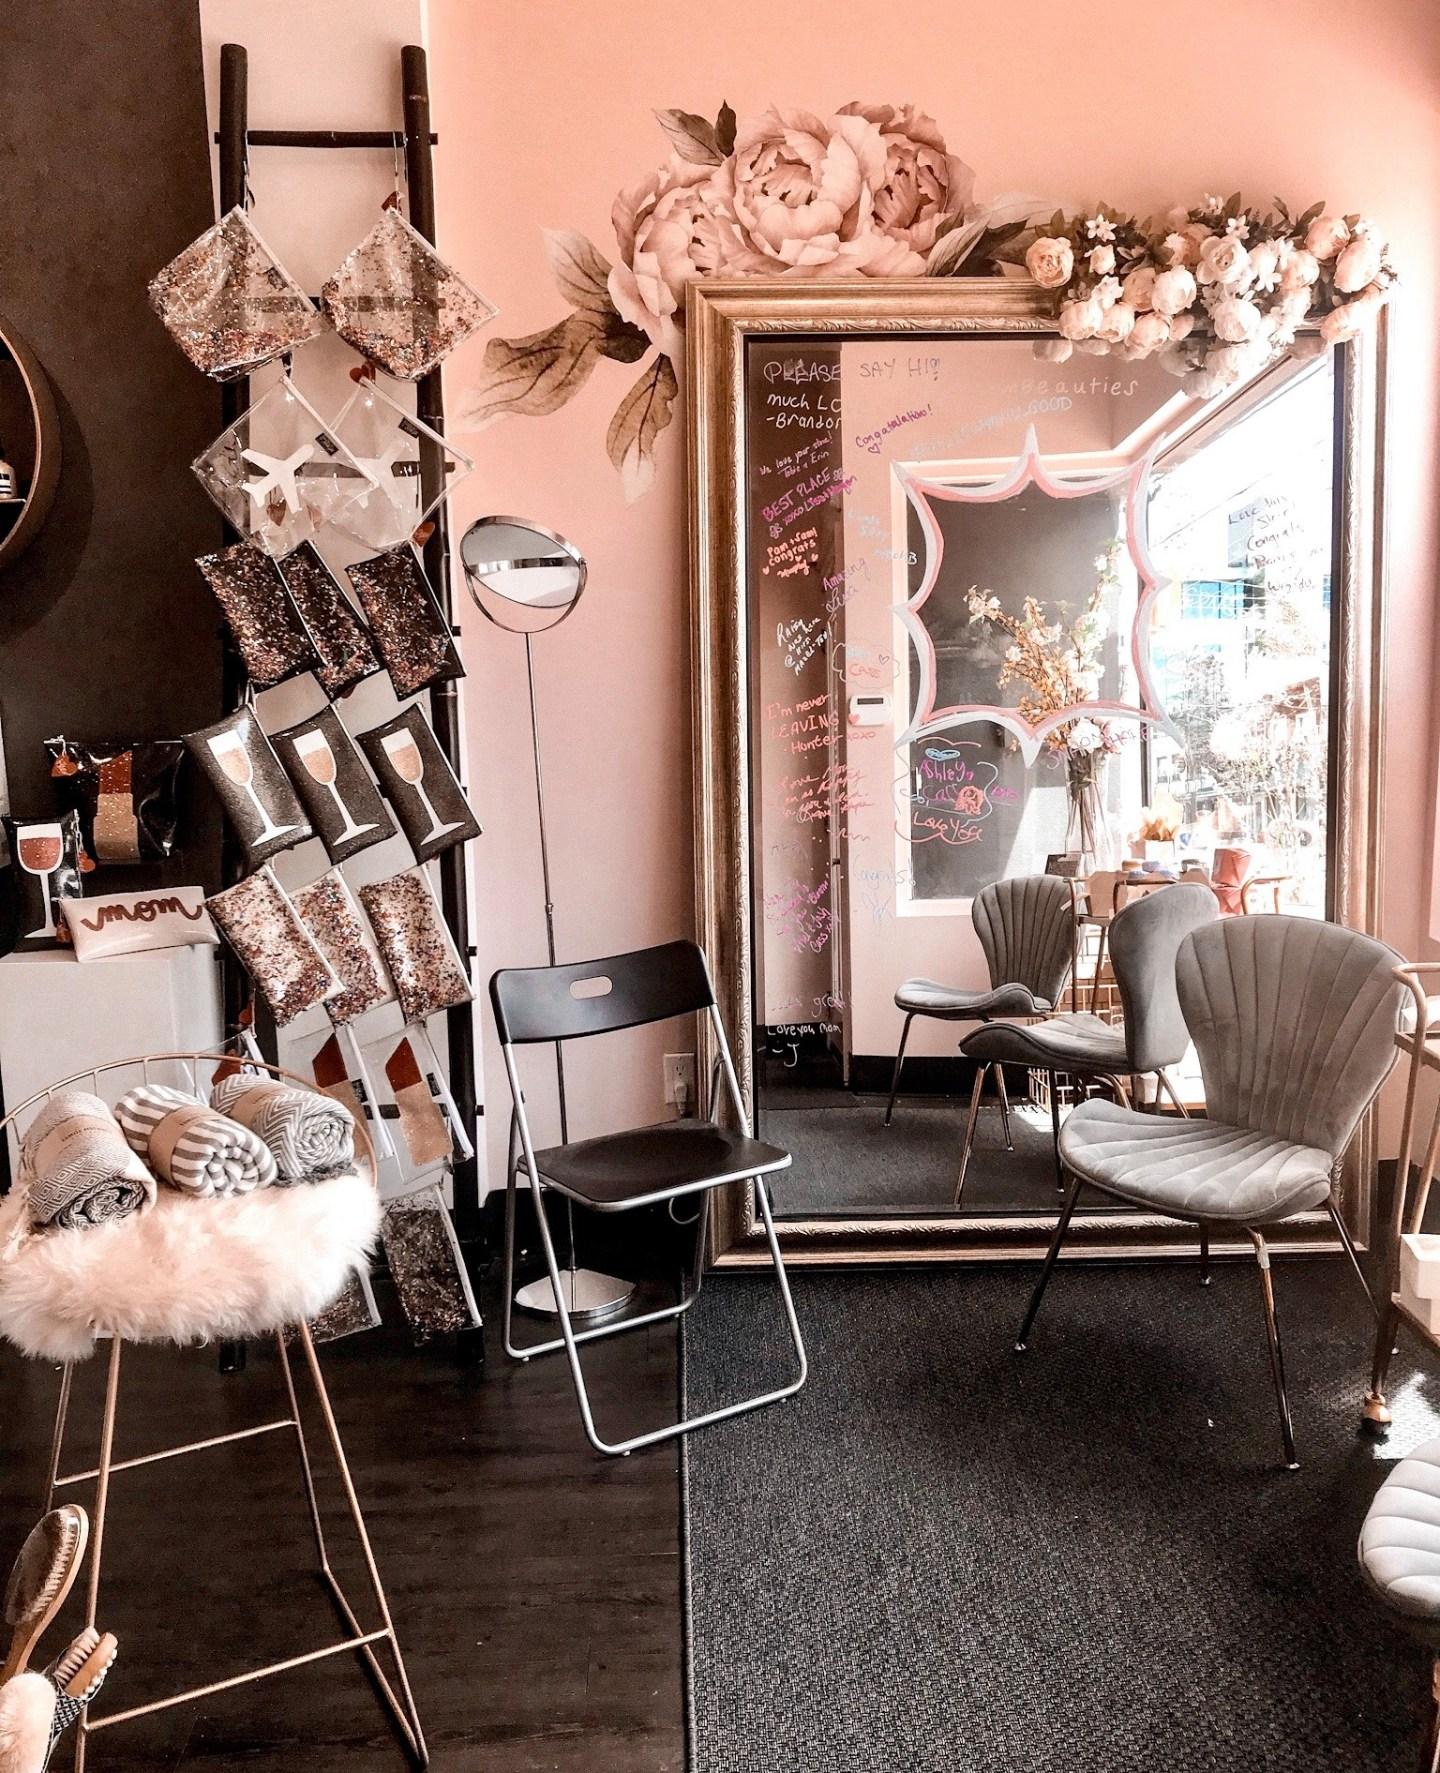 Bloom Beauty- Toronto's First Clean Beauty Makeup Studio